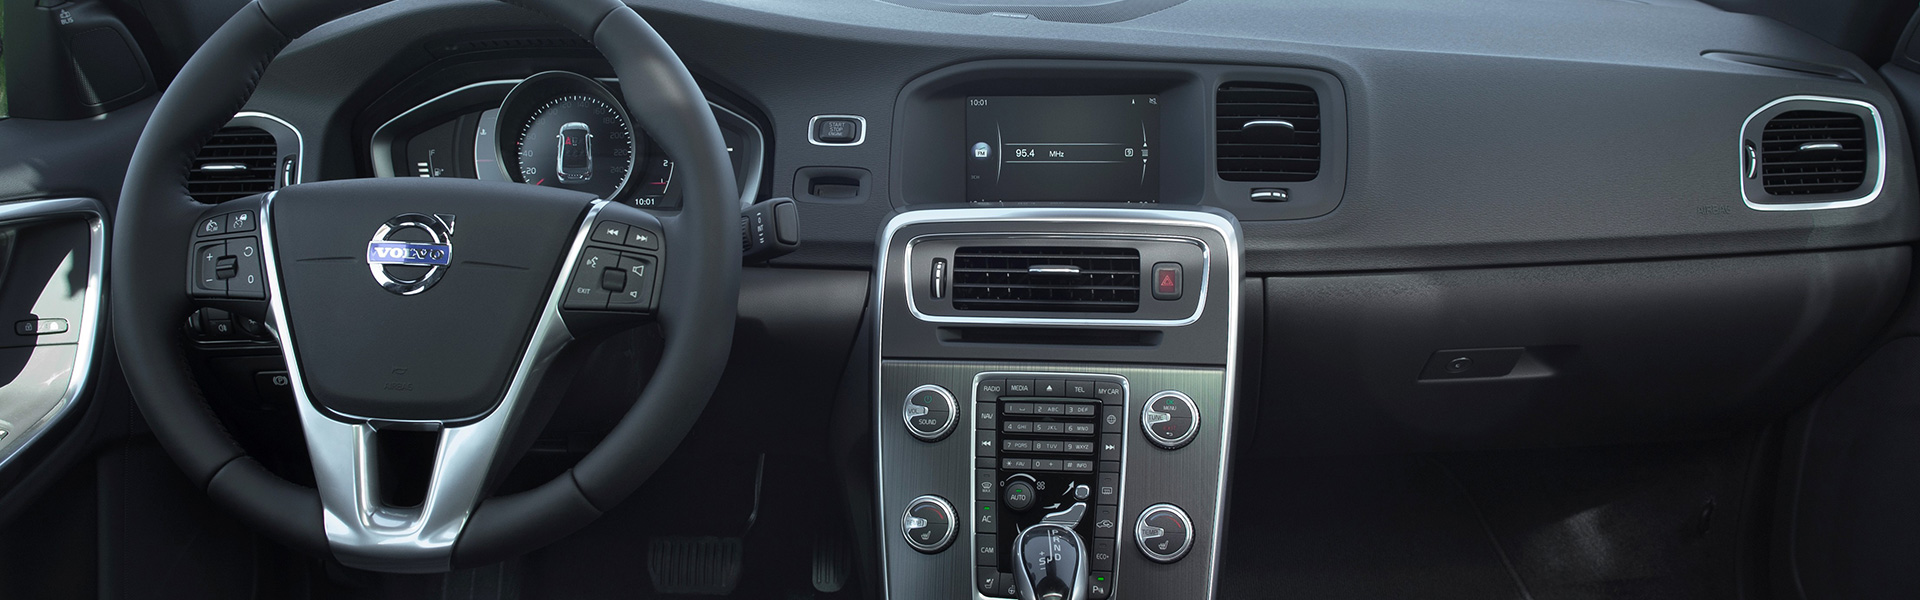 Volvo dash